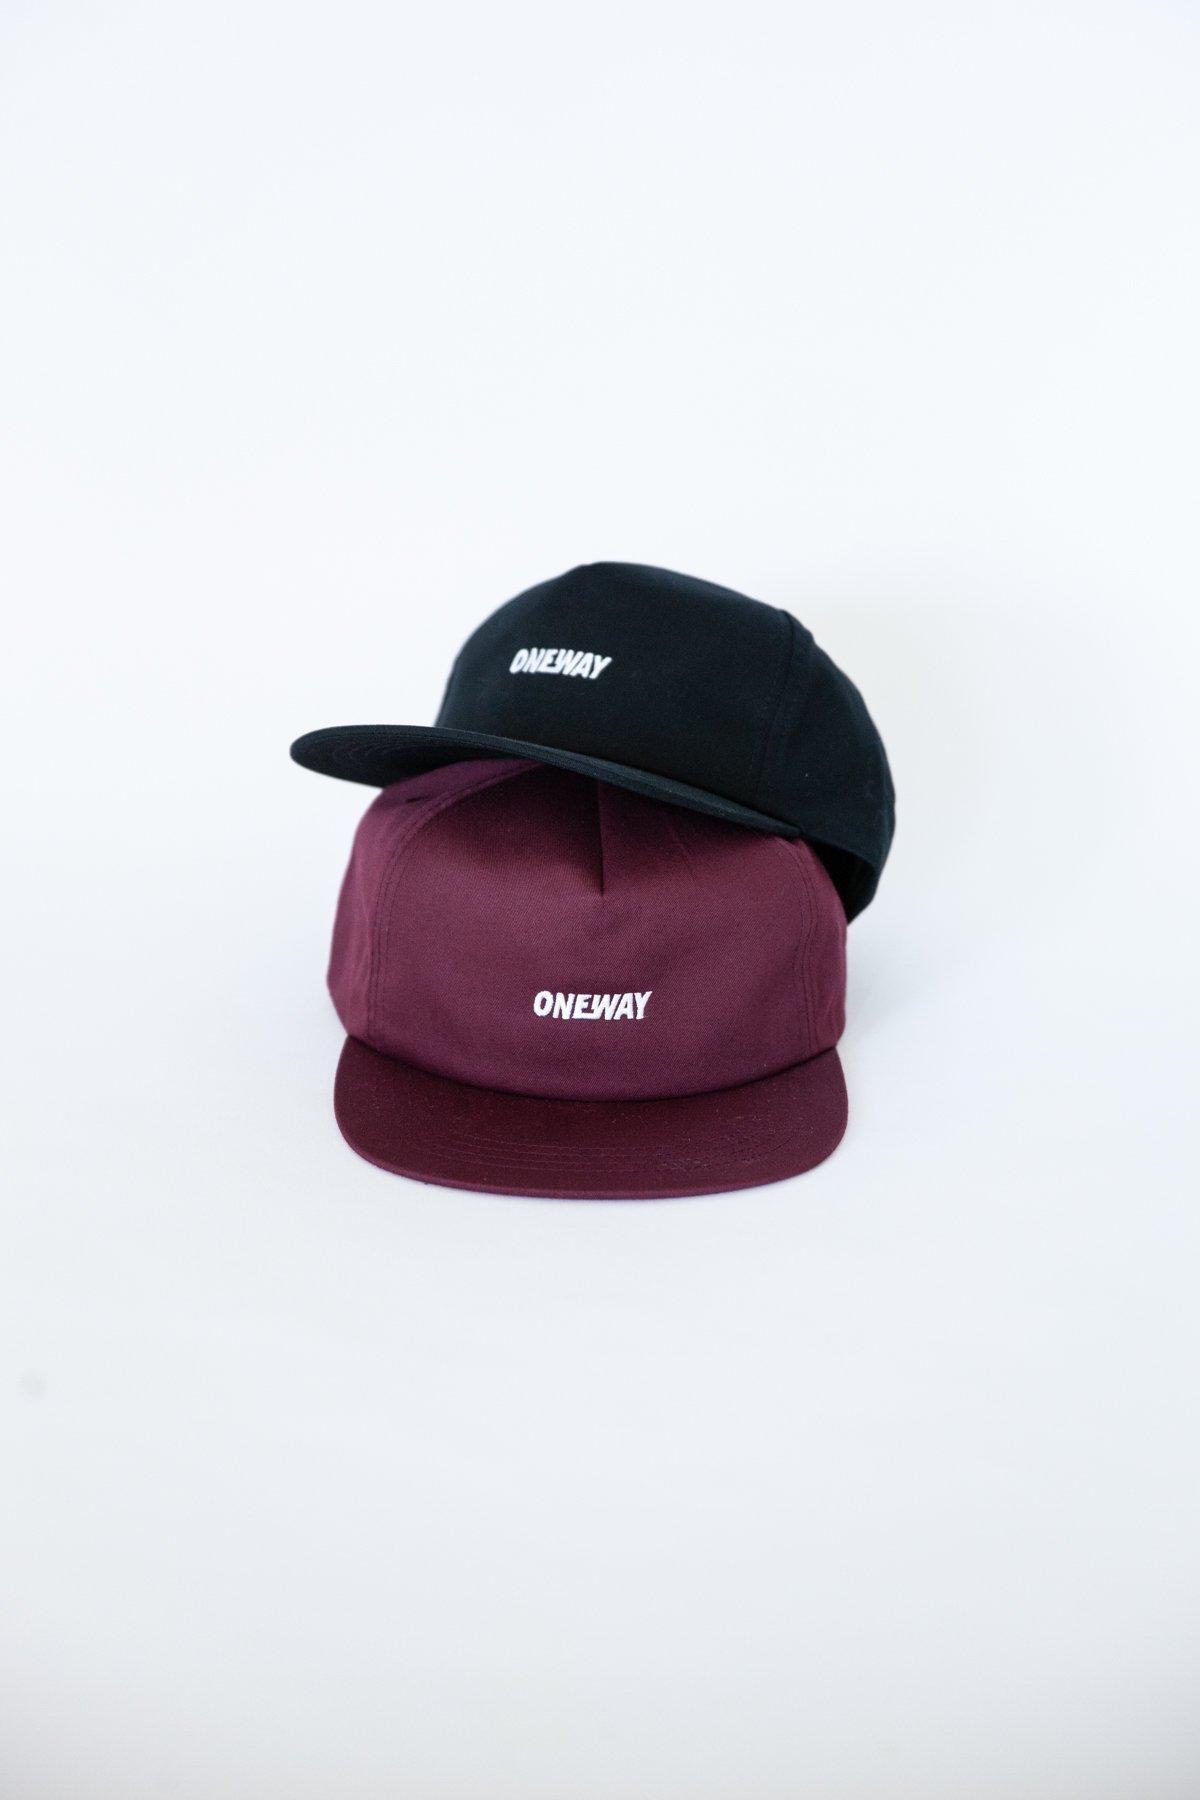 ONEWAY / ONEWAY LOGO CAP